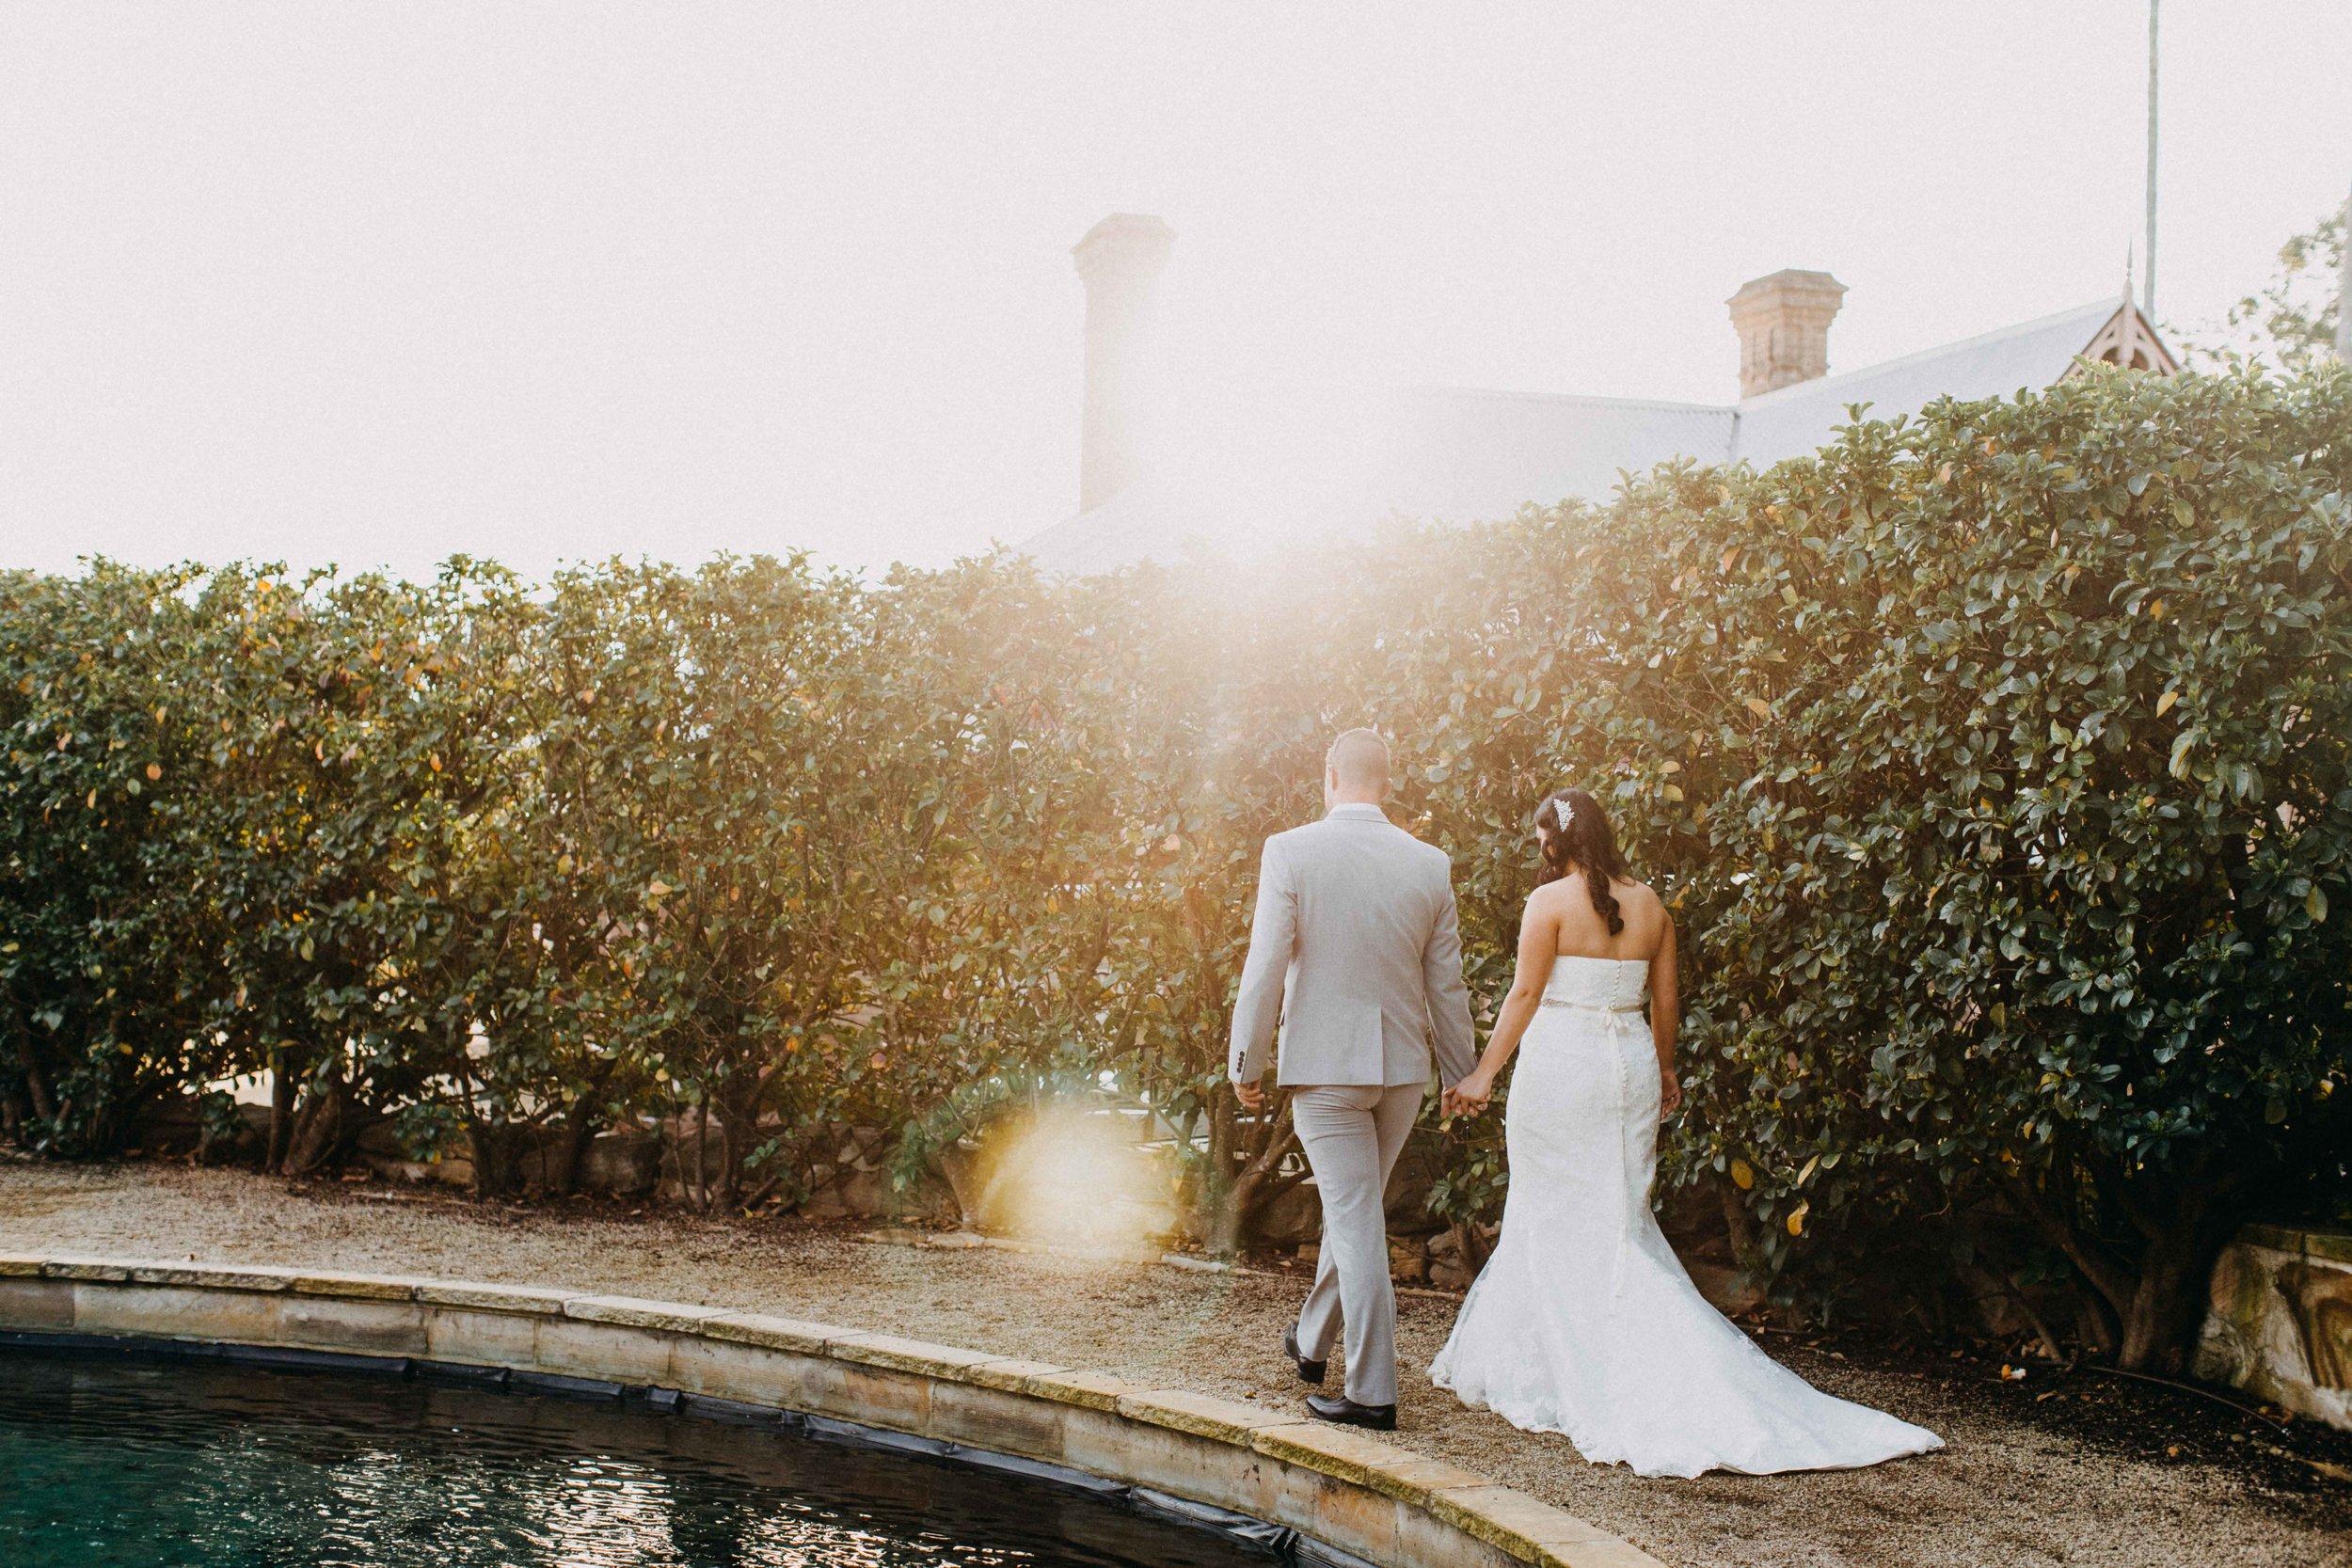 burnham-grove-camden-wedding-emilyobrienphotography-macarthur-105.jpg